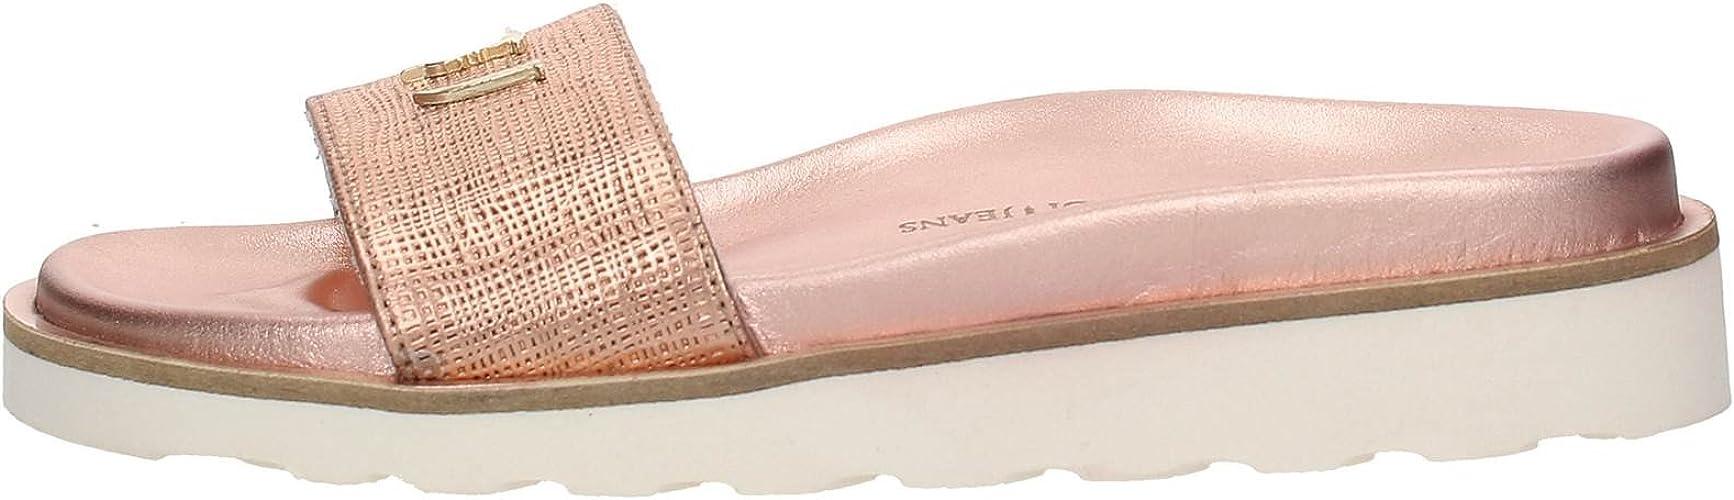 Amazon.it: TRUSSARDI Sandali moda Sandali e ciabatte